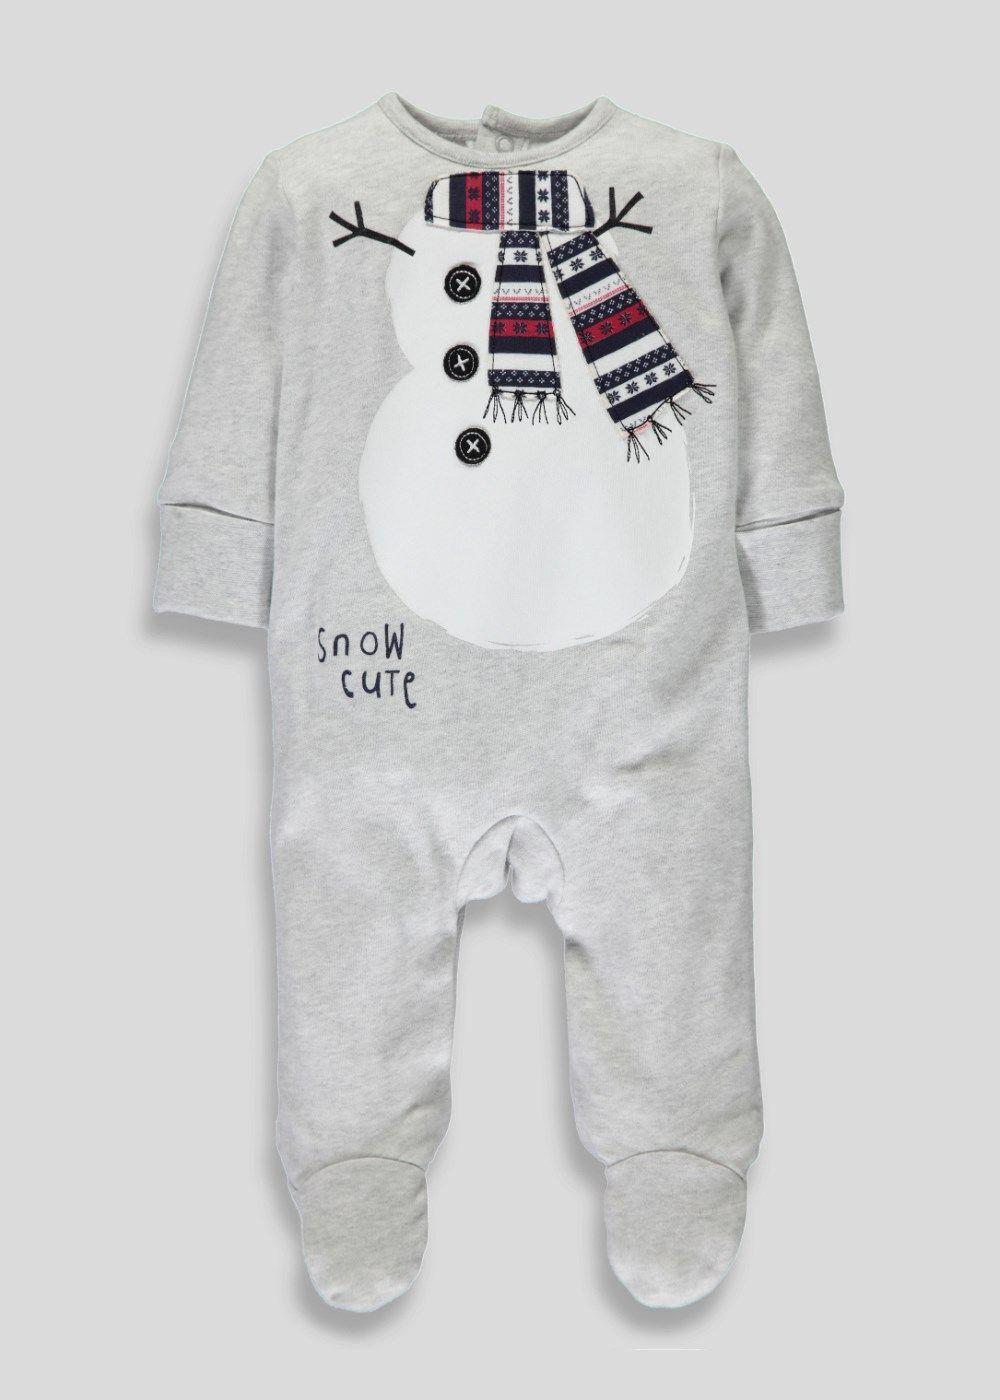 365070eda437 Unisex Christmas Sleepsuit (Newborn-12mnths) - Matalan